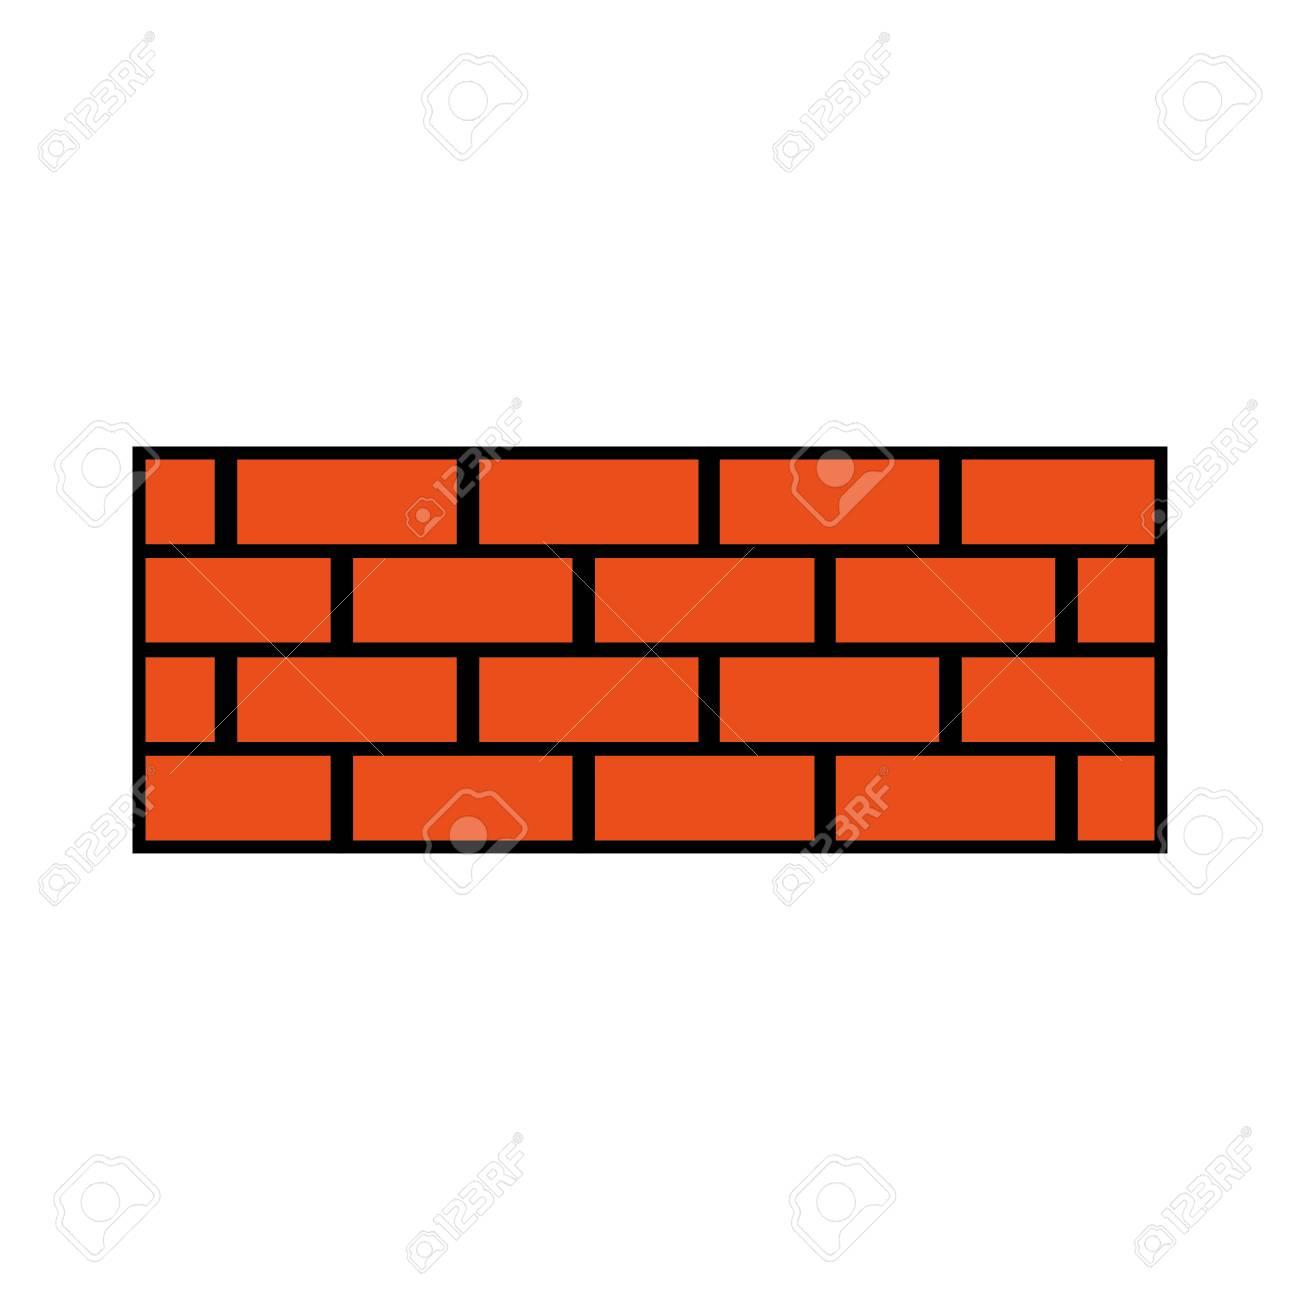 Brick wall construction concret image vector illustration - 93597150